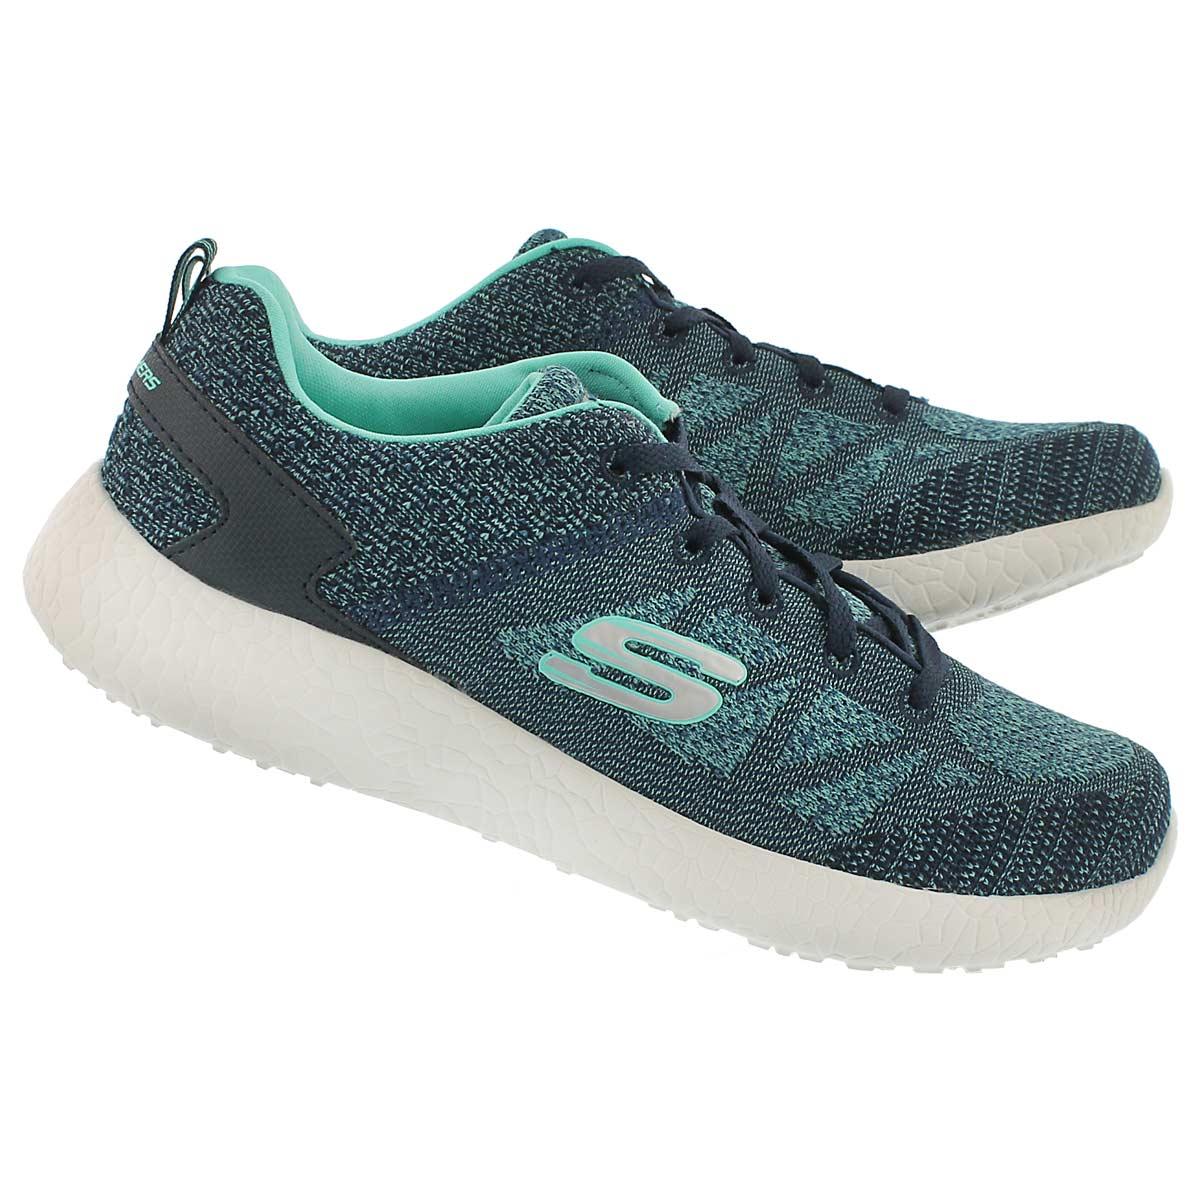 Lds Burst navy lace up running shoe